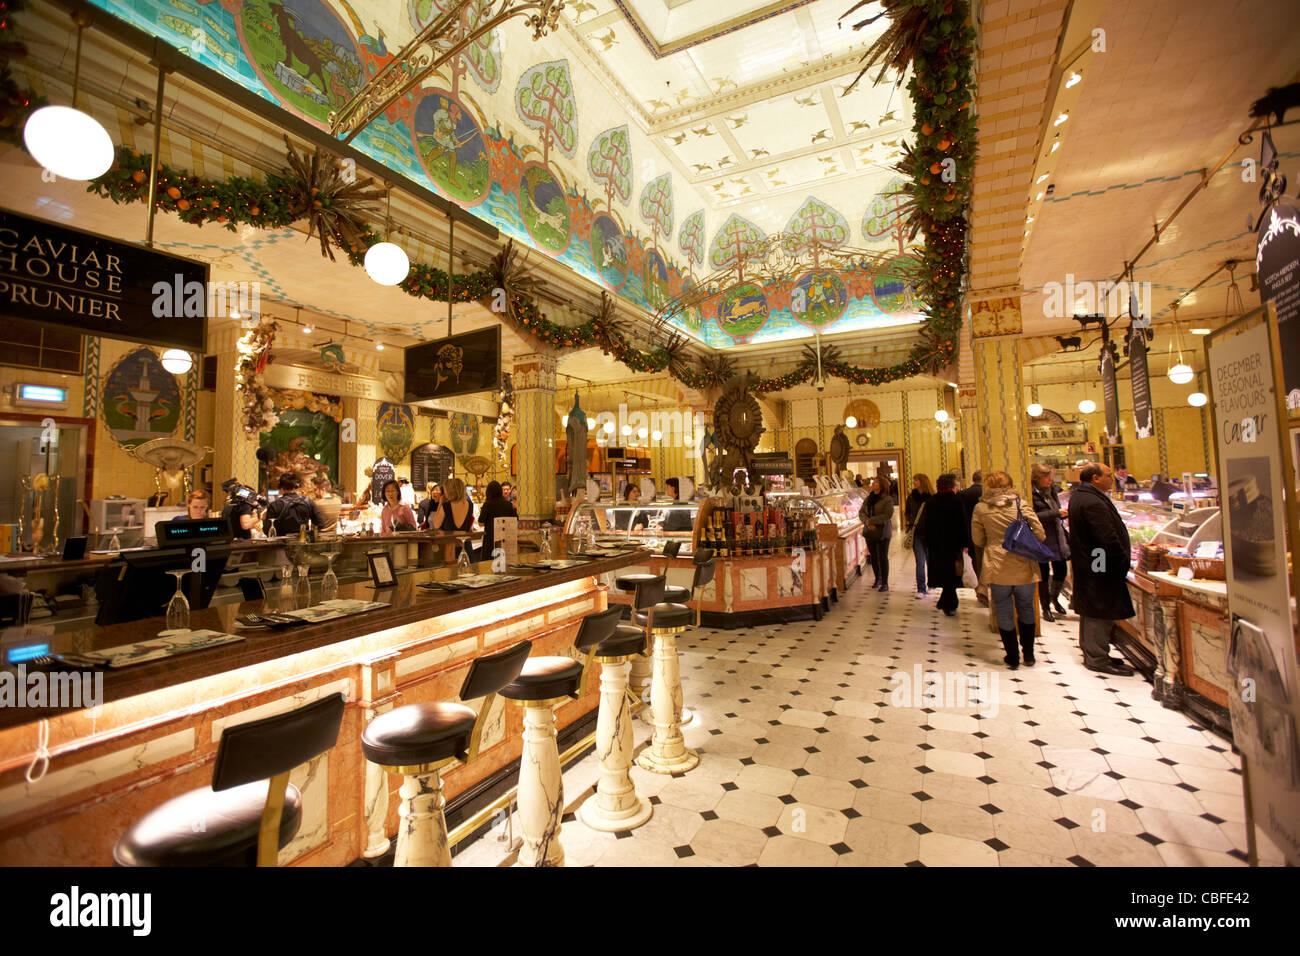 intrieur de harrods magasin dalimentation et bar sushi et caviar bar londres angleterre royaume uni uk